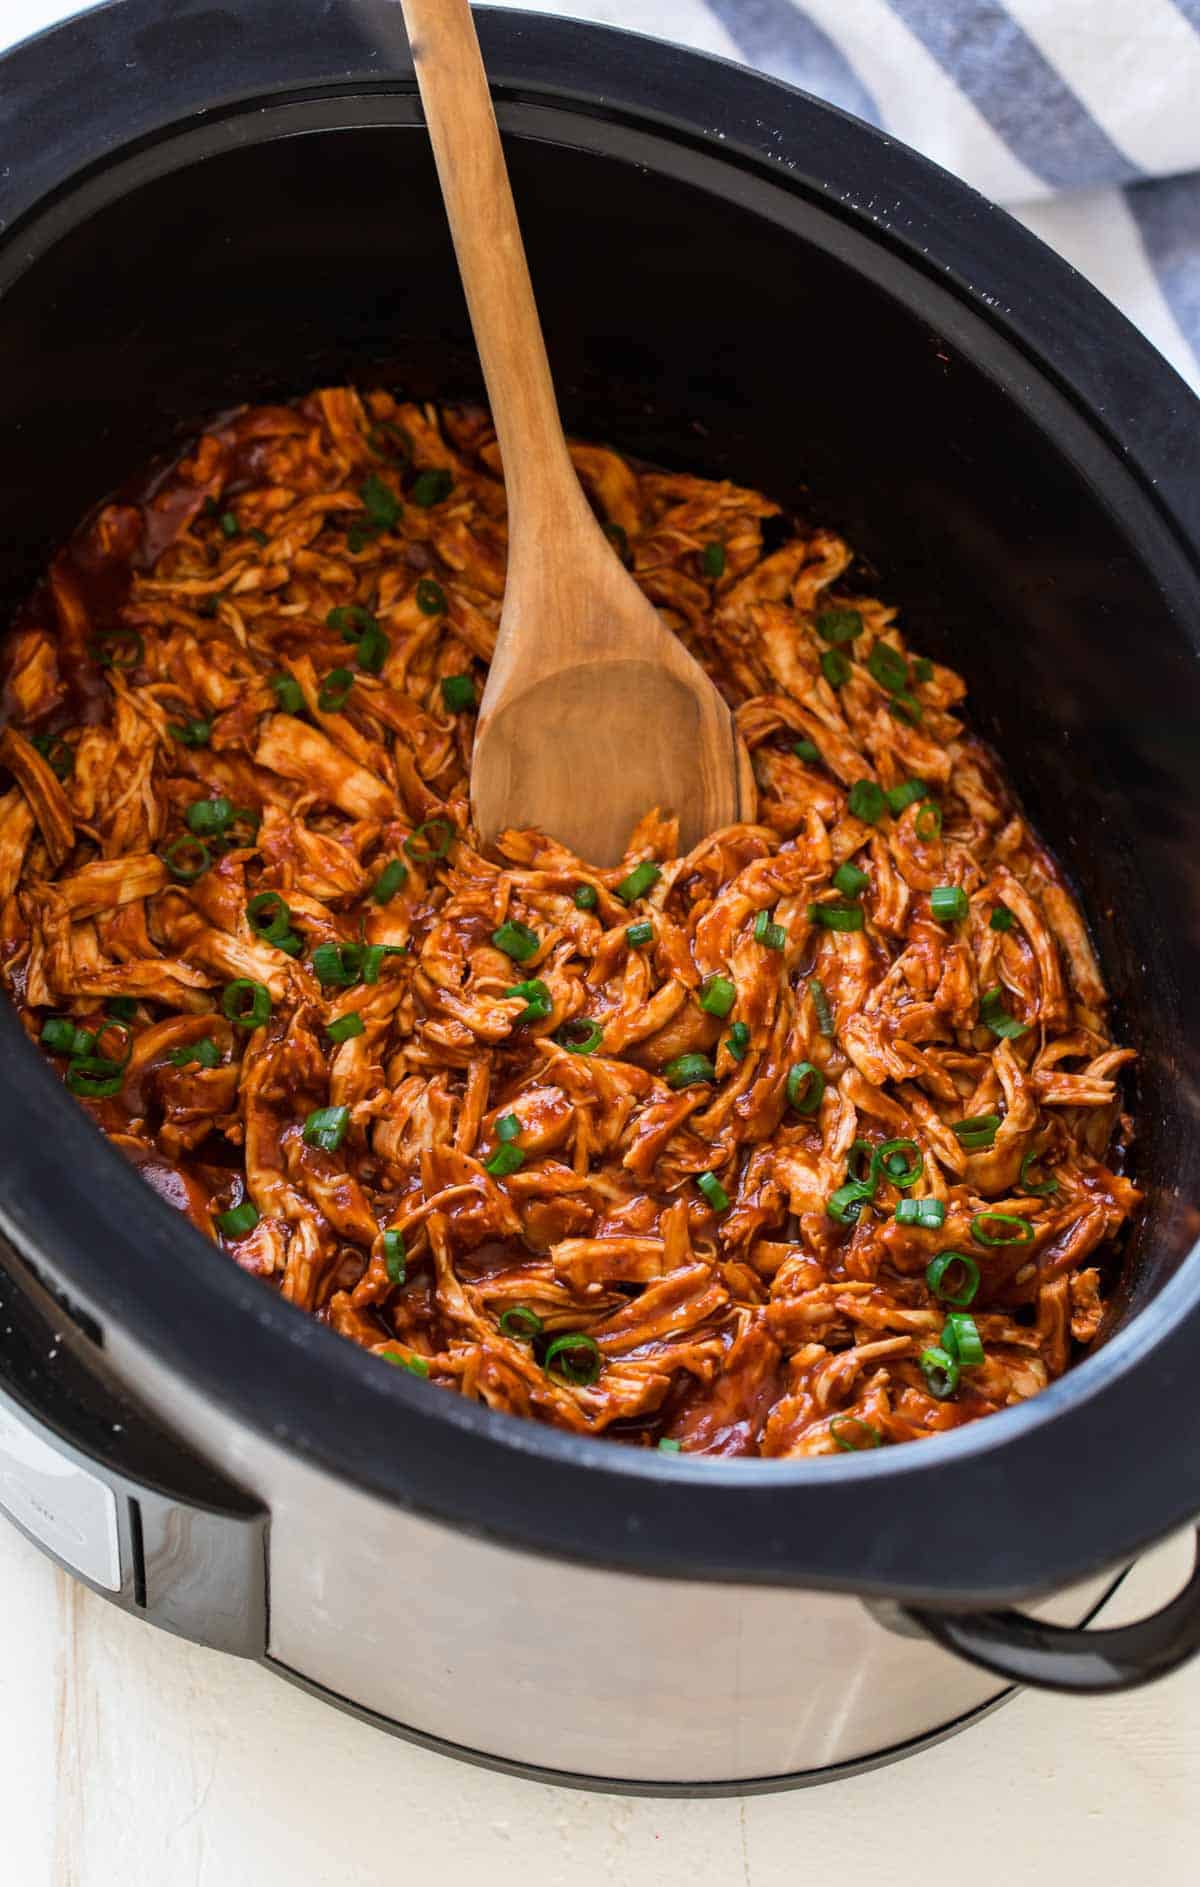 Crockpot BBQ Chicken | Tender, Easy Crockpot Chicken Recipe